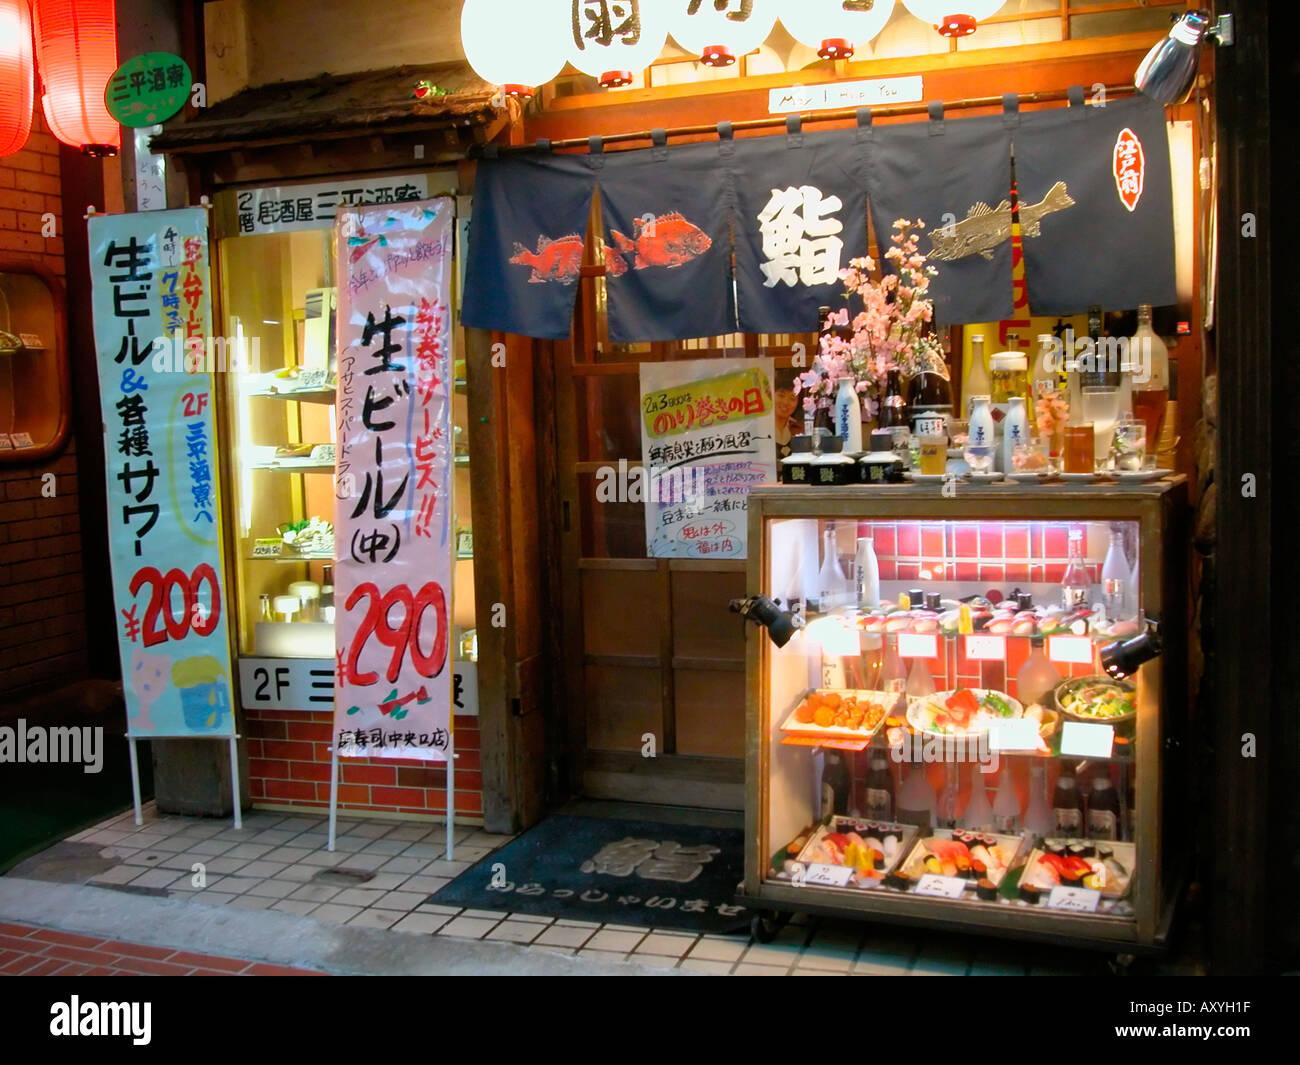 Entrance To Small Restaurant Bar Shinjuku District Tokyo Japan Stock Photo Alamy